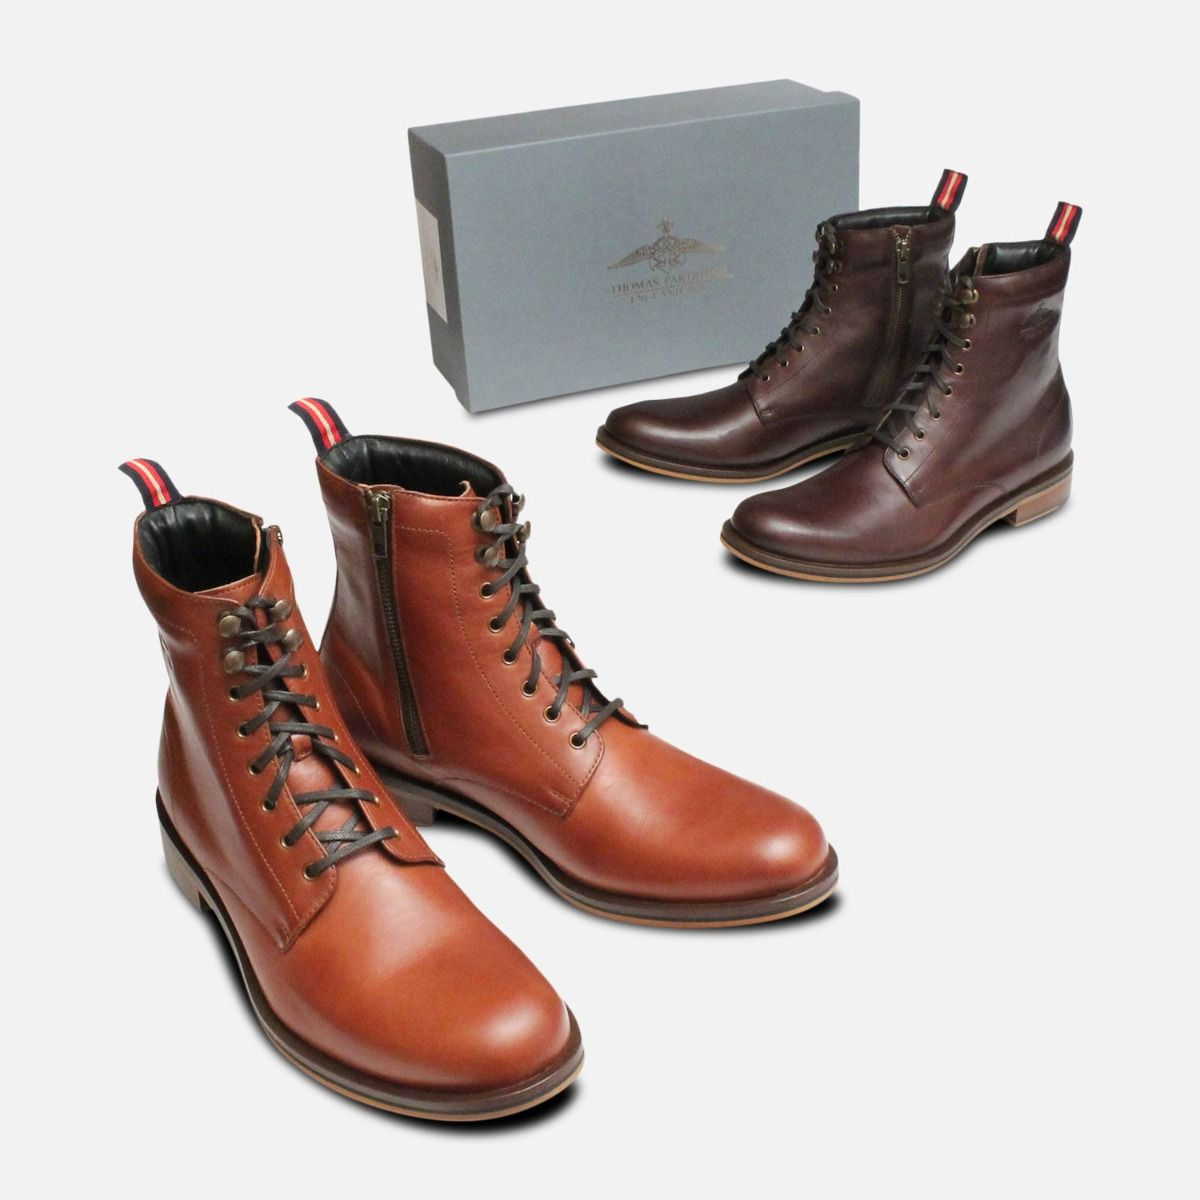 Thomas Partridge Mens Sergeant Boots in Chestnut